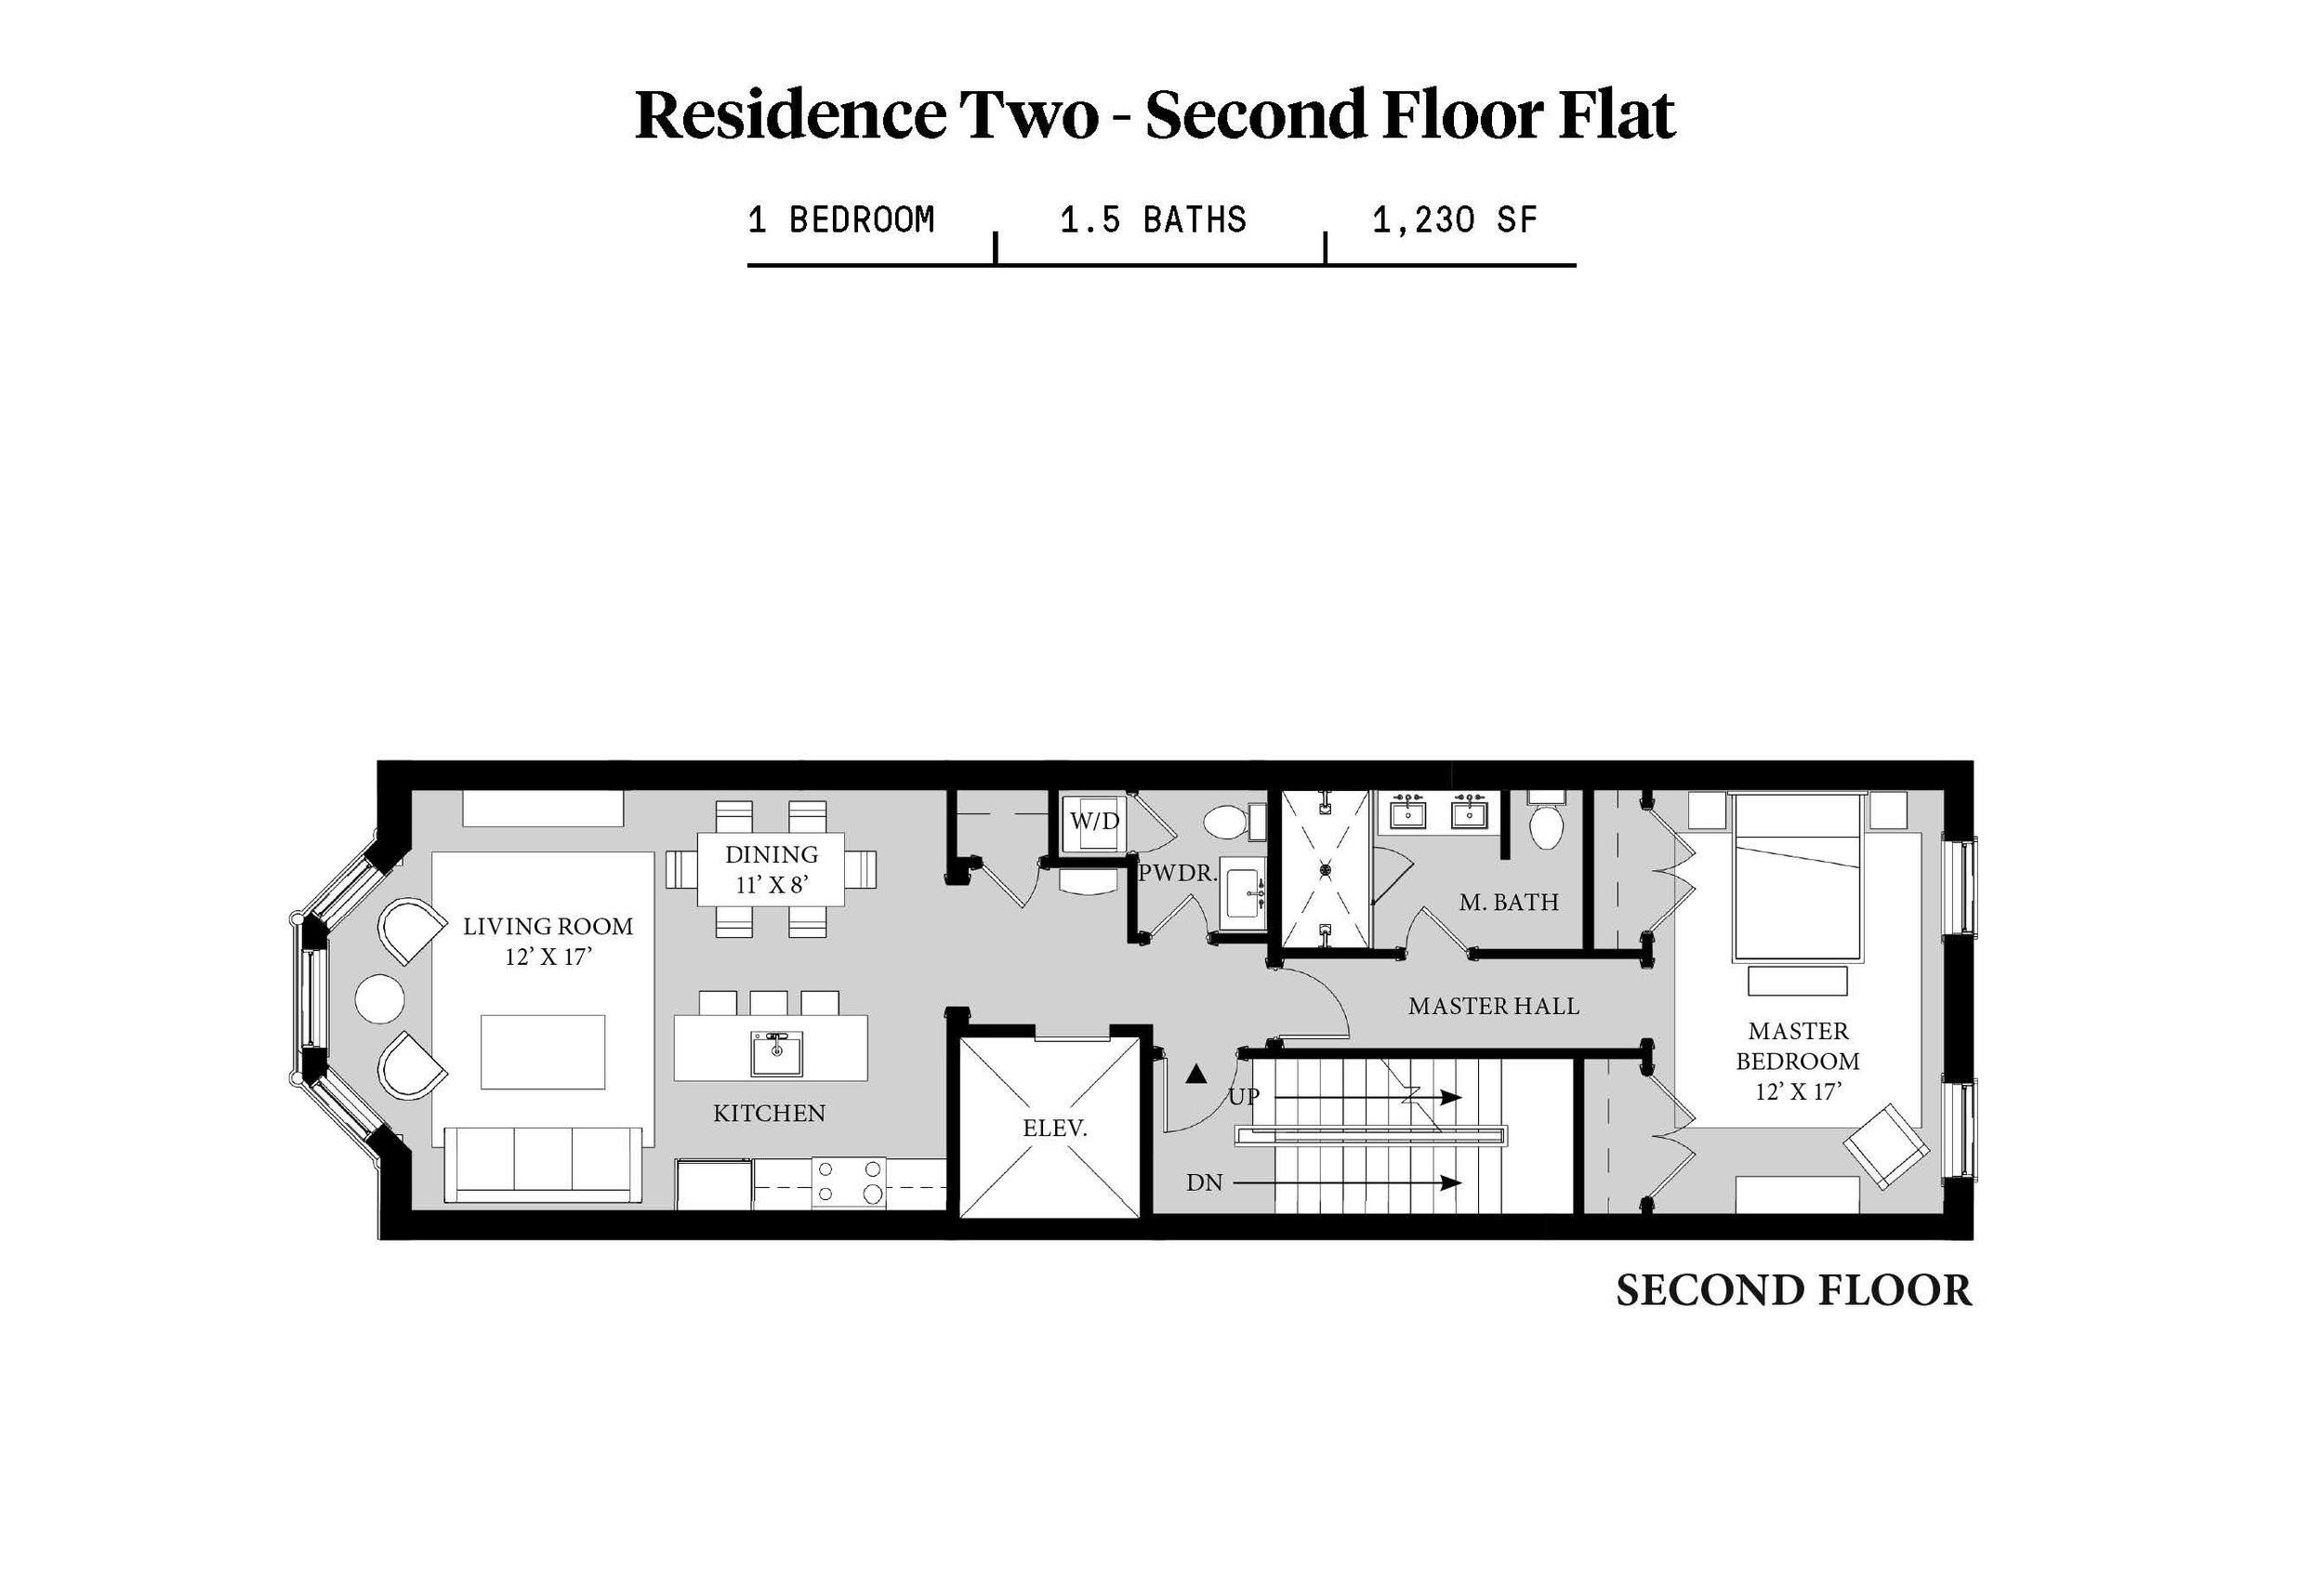 Caulfield+Properties--80+Comm+Ave+Floor+Plan+Inserts_Final_02.jpg